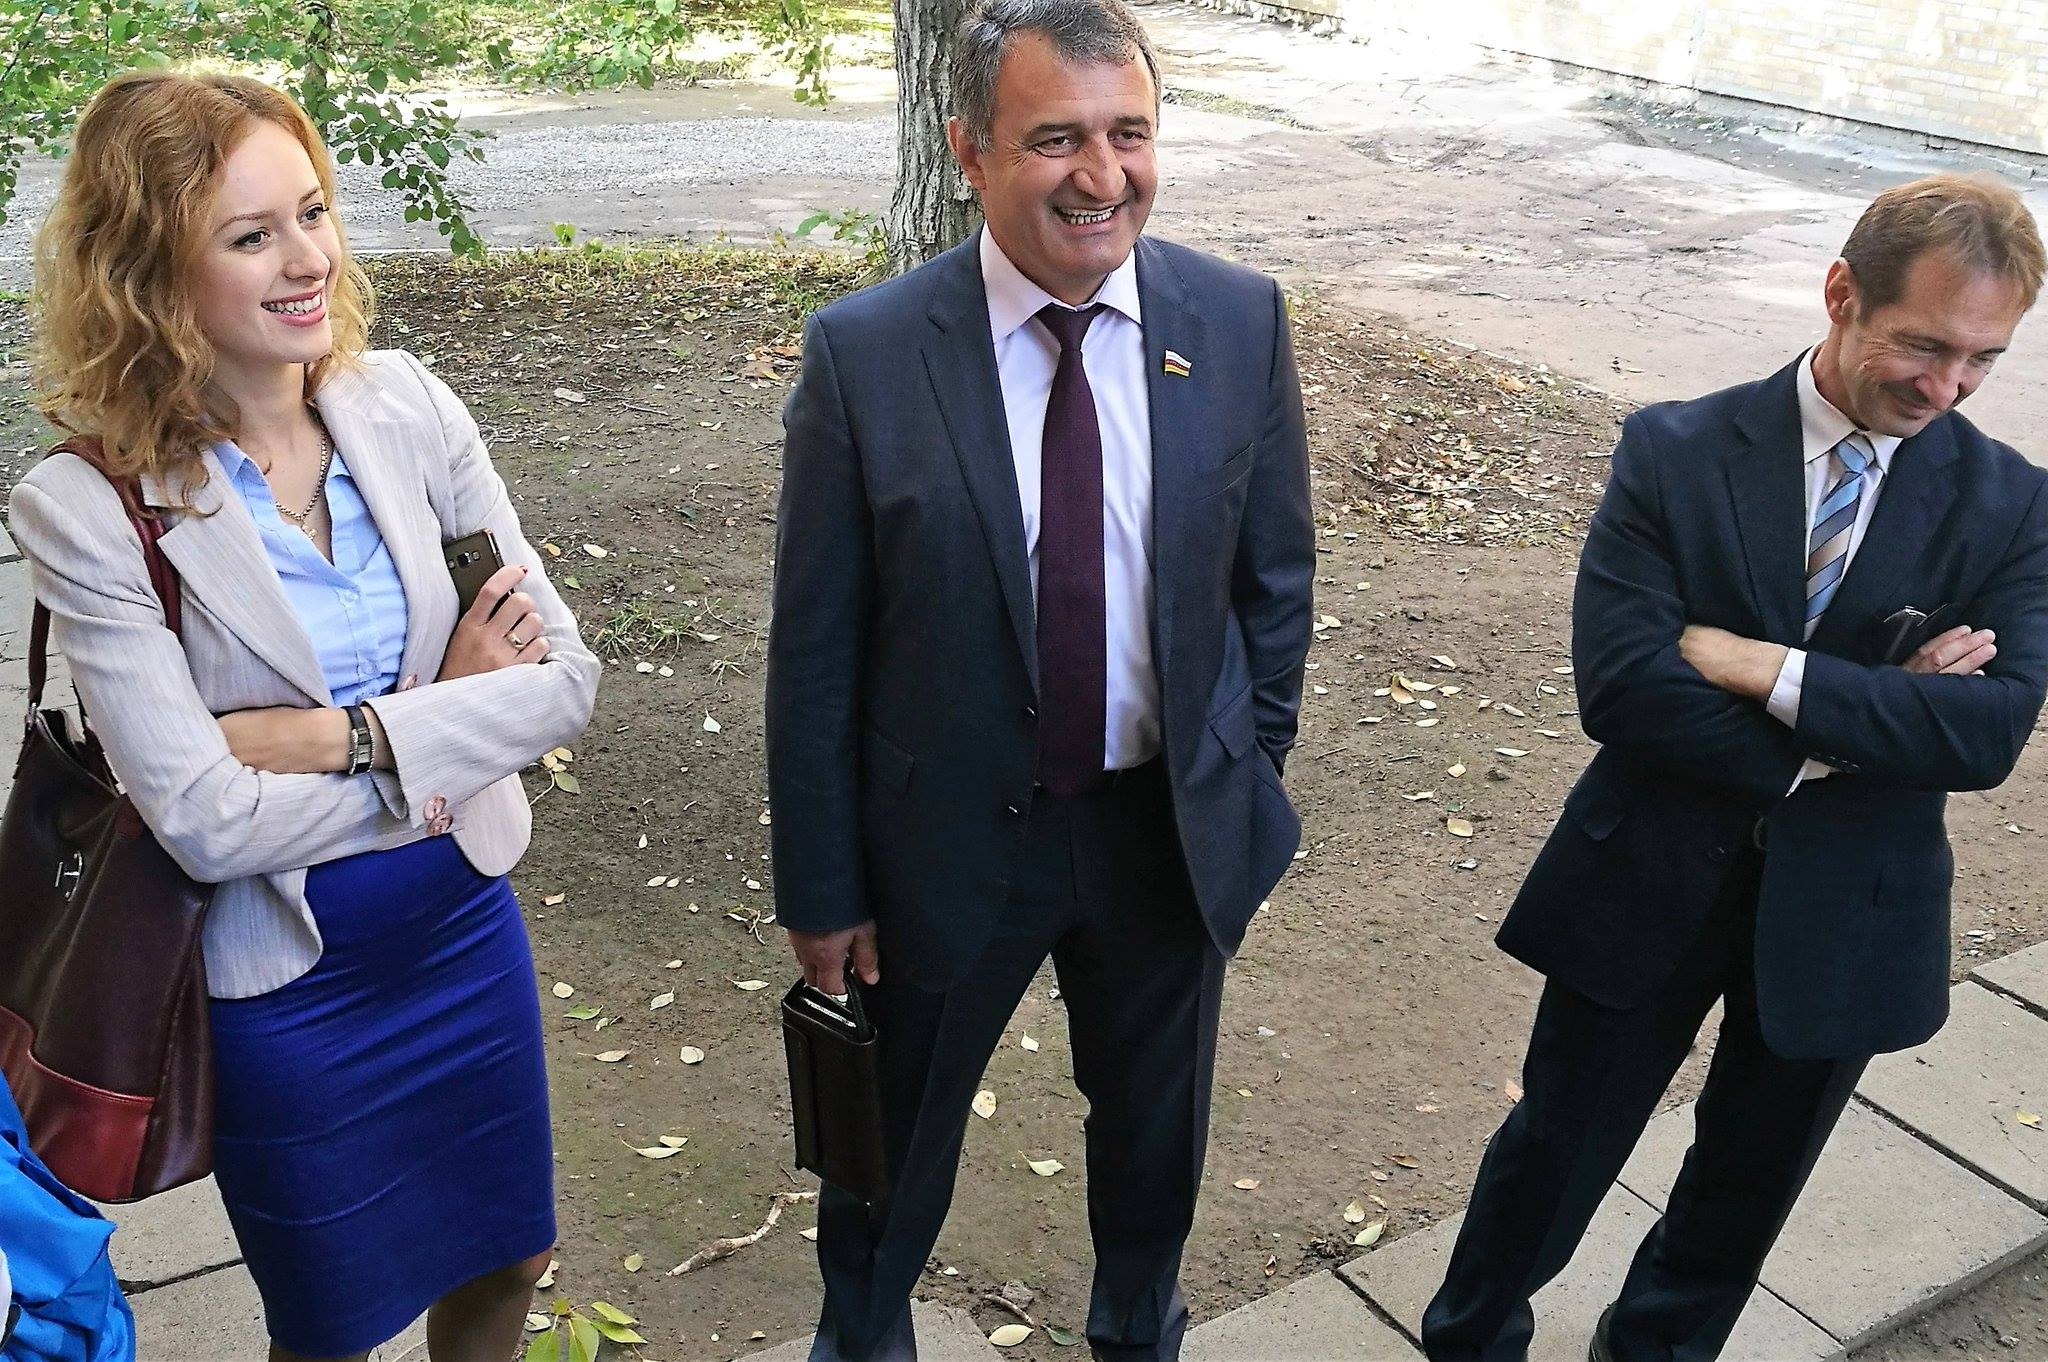 v.l.n.r: Dolmetscherin, Anatoliy Bibilov, Eliseo Bertolasi